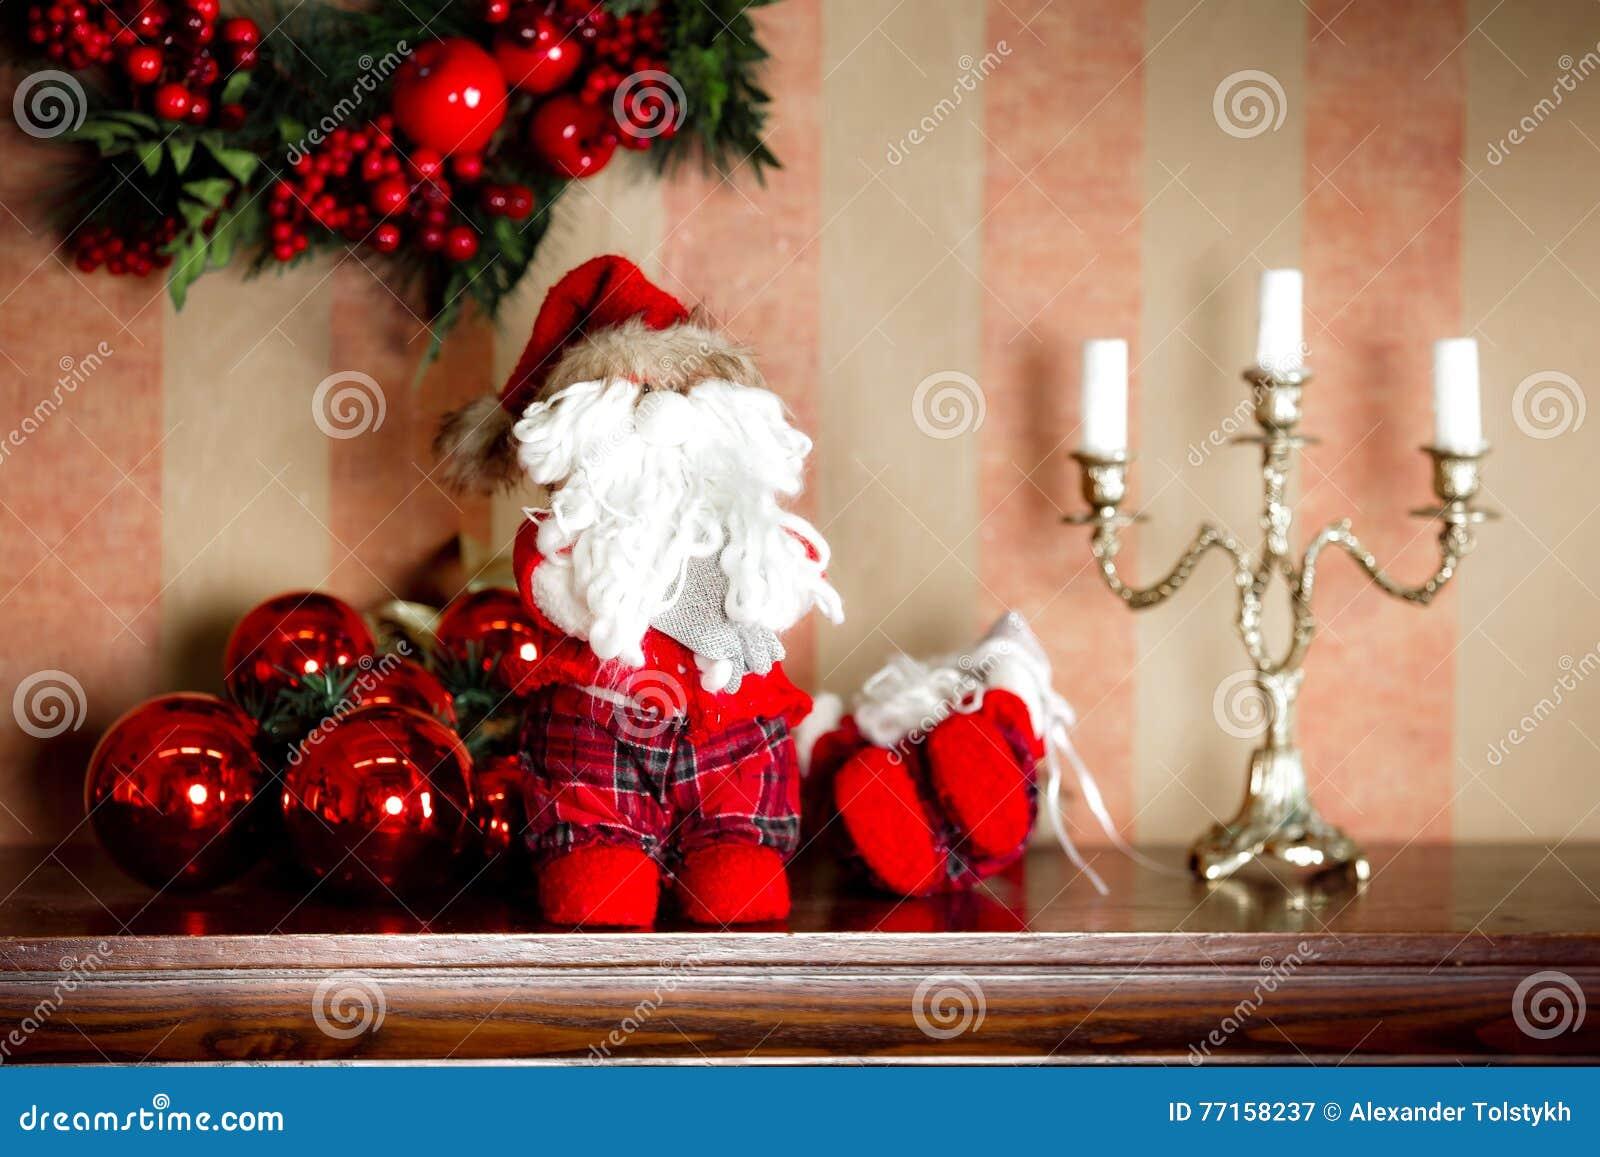 Fond de decotarion de Noël